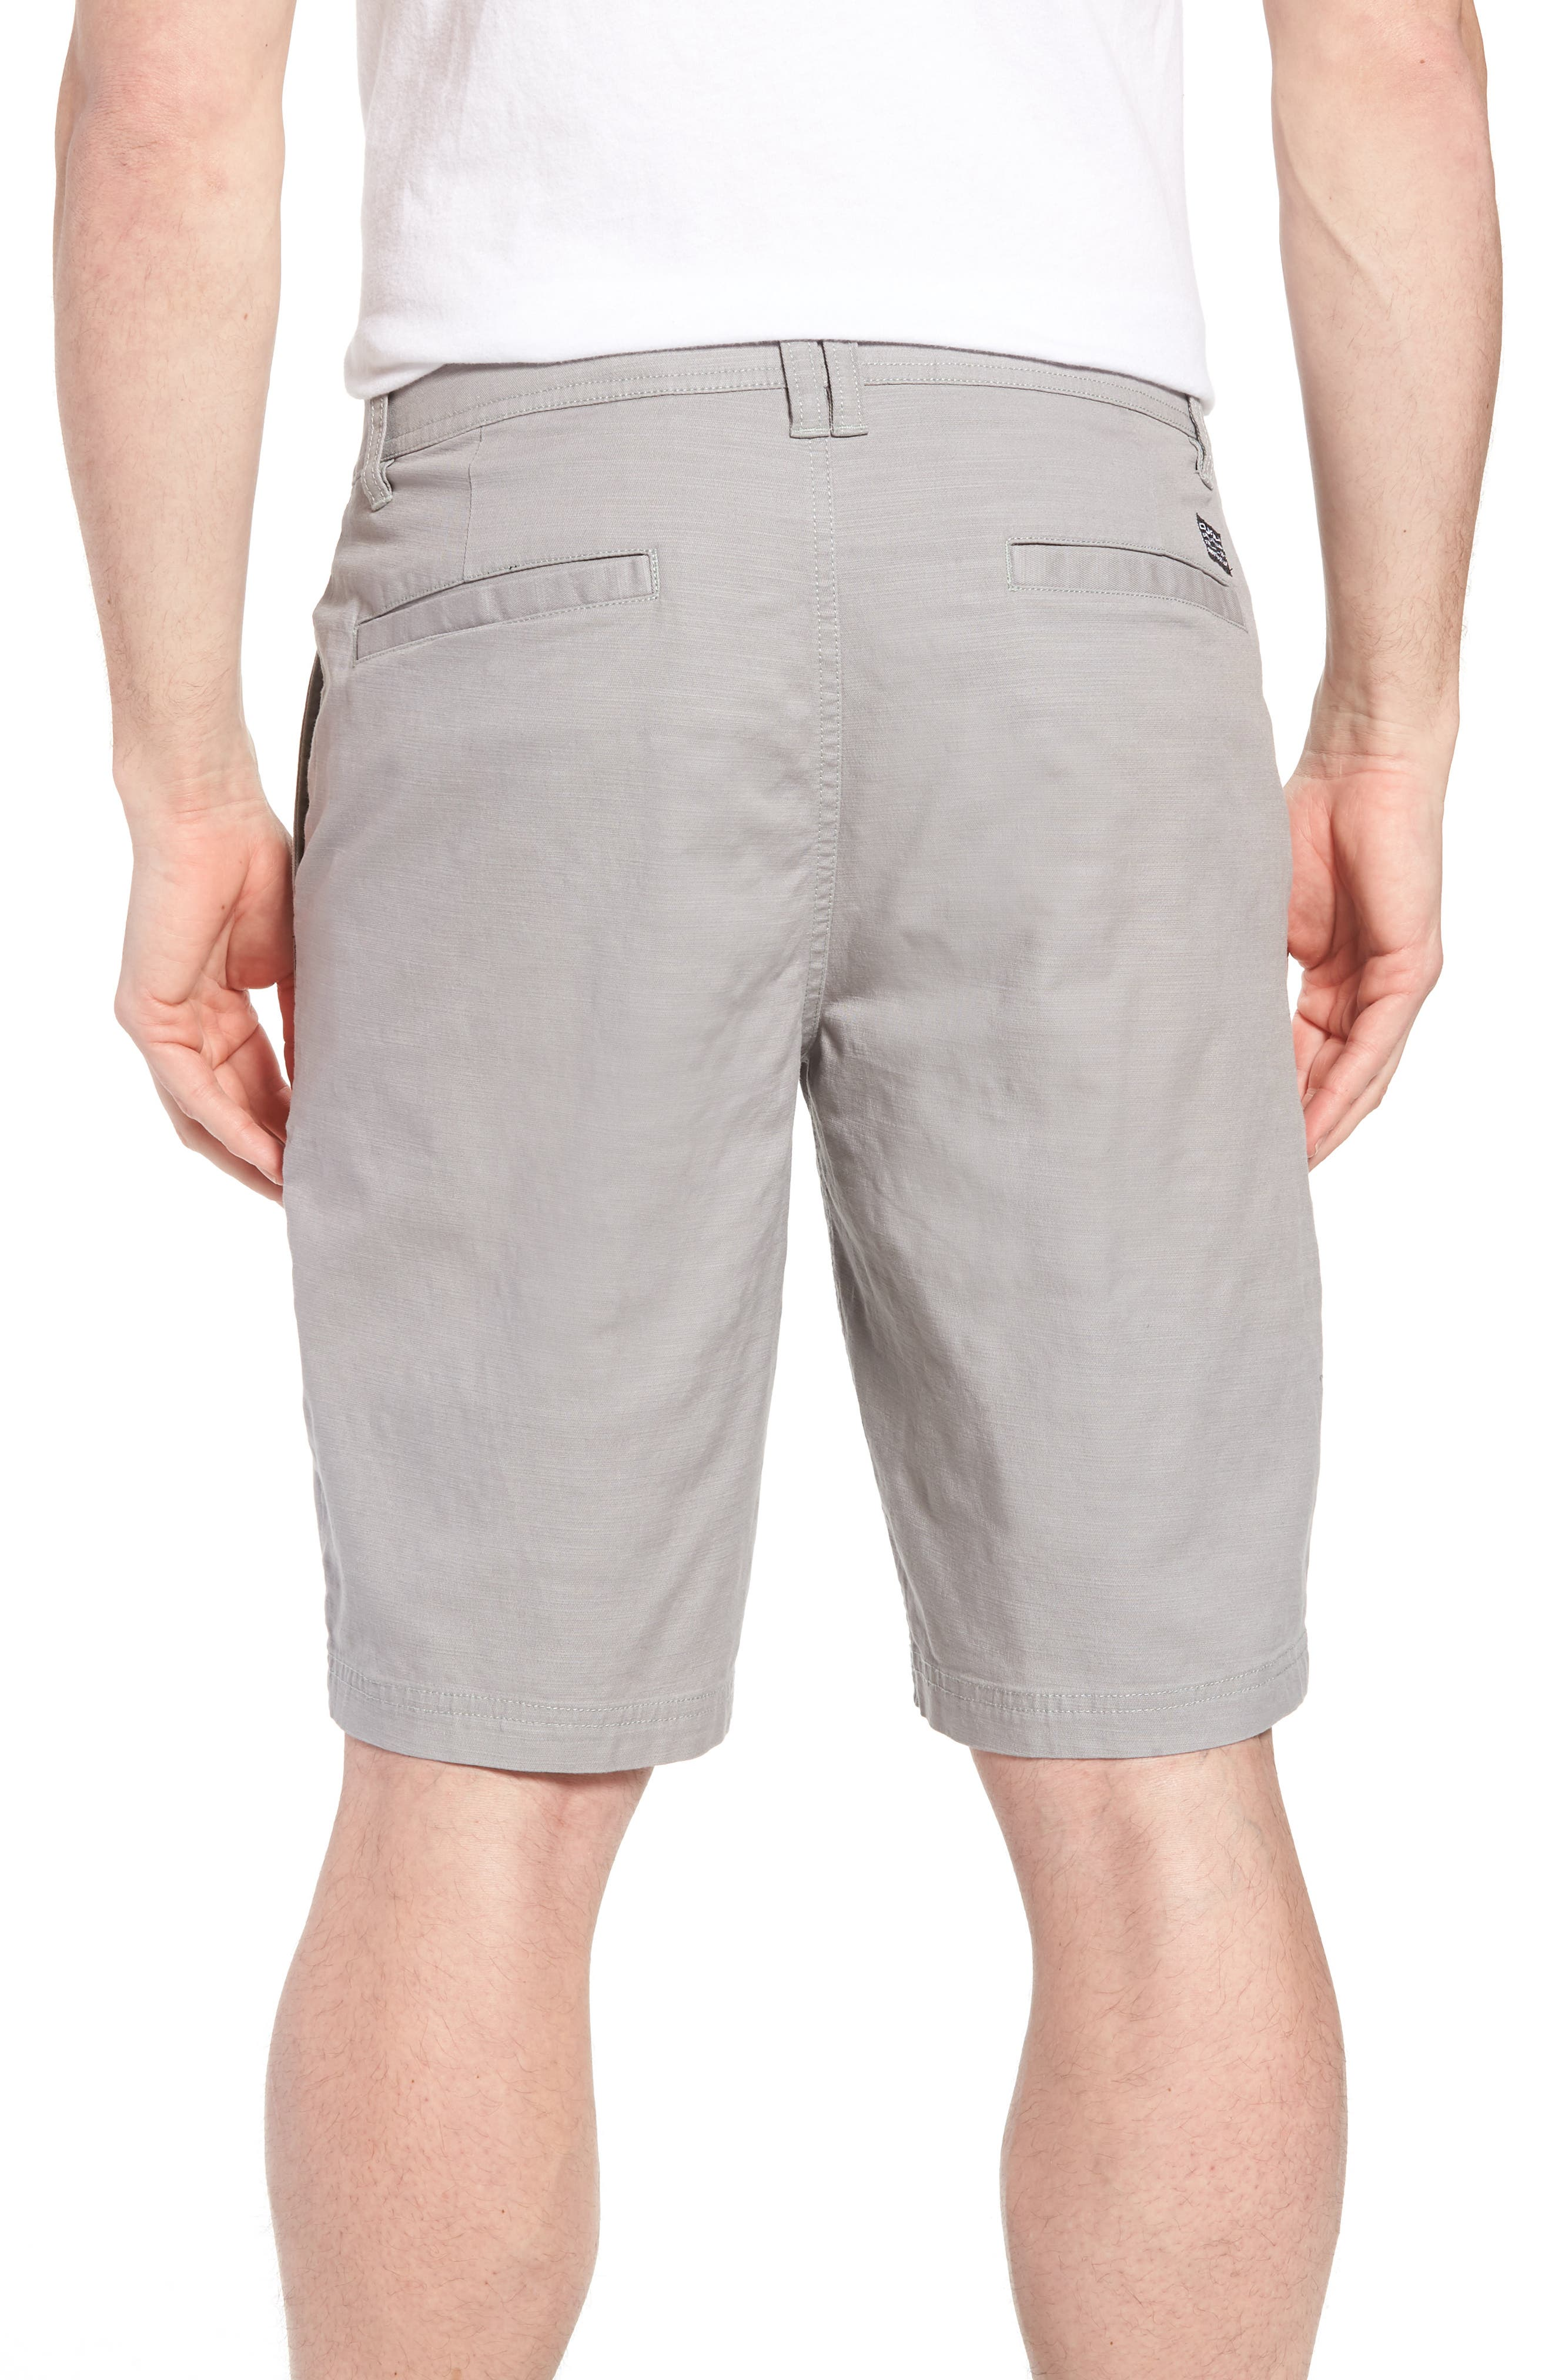 Jay Stretch Chino Shorts,                             Alternate thumbnail 2, color,                             Light Grey